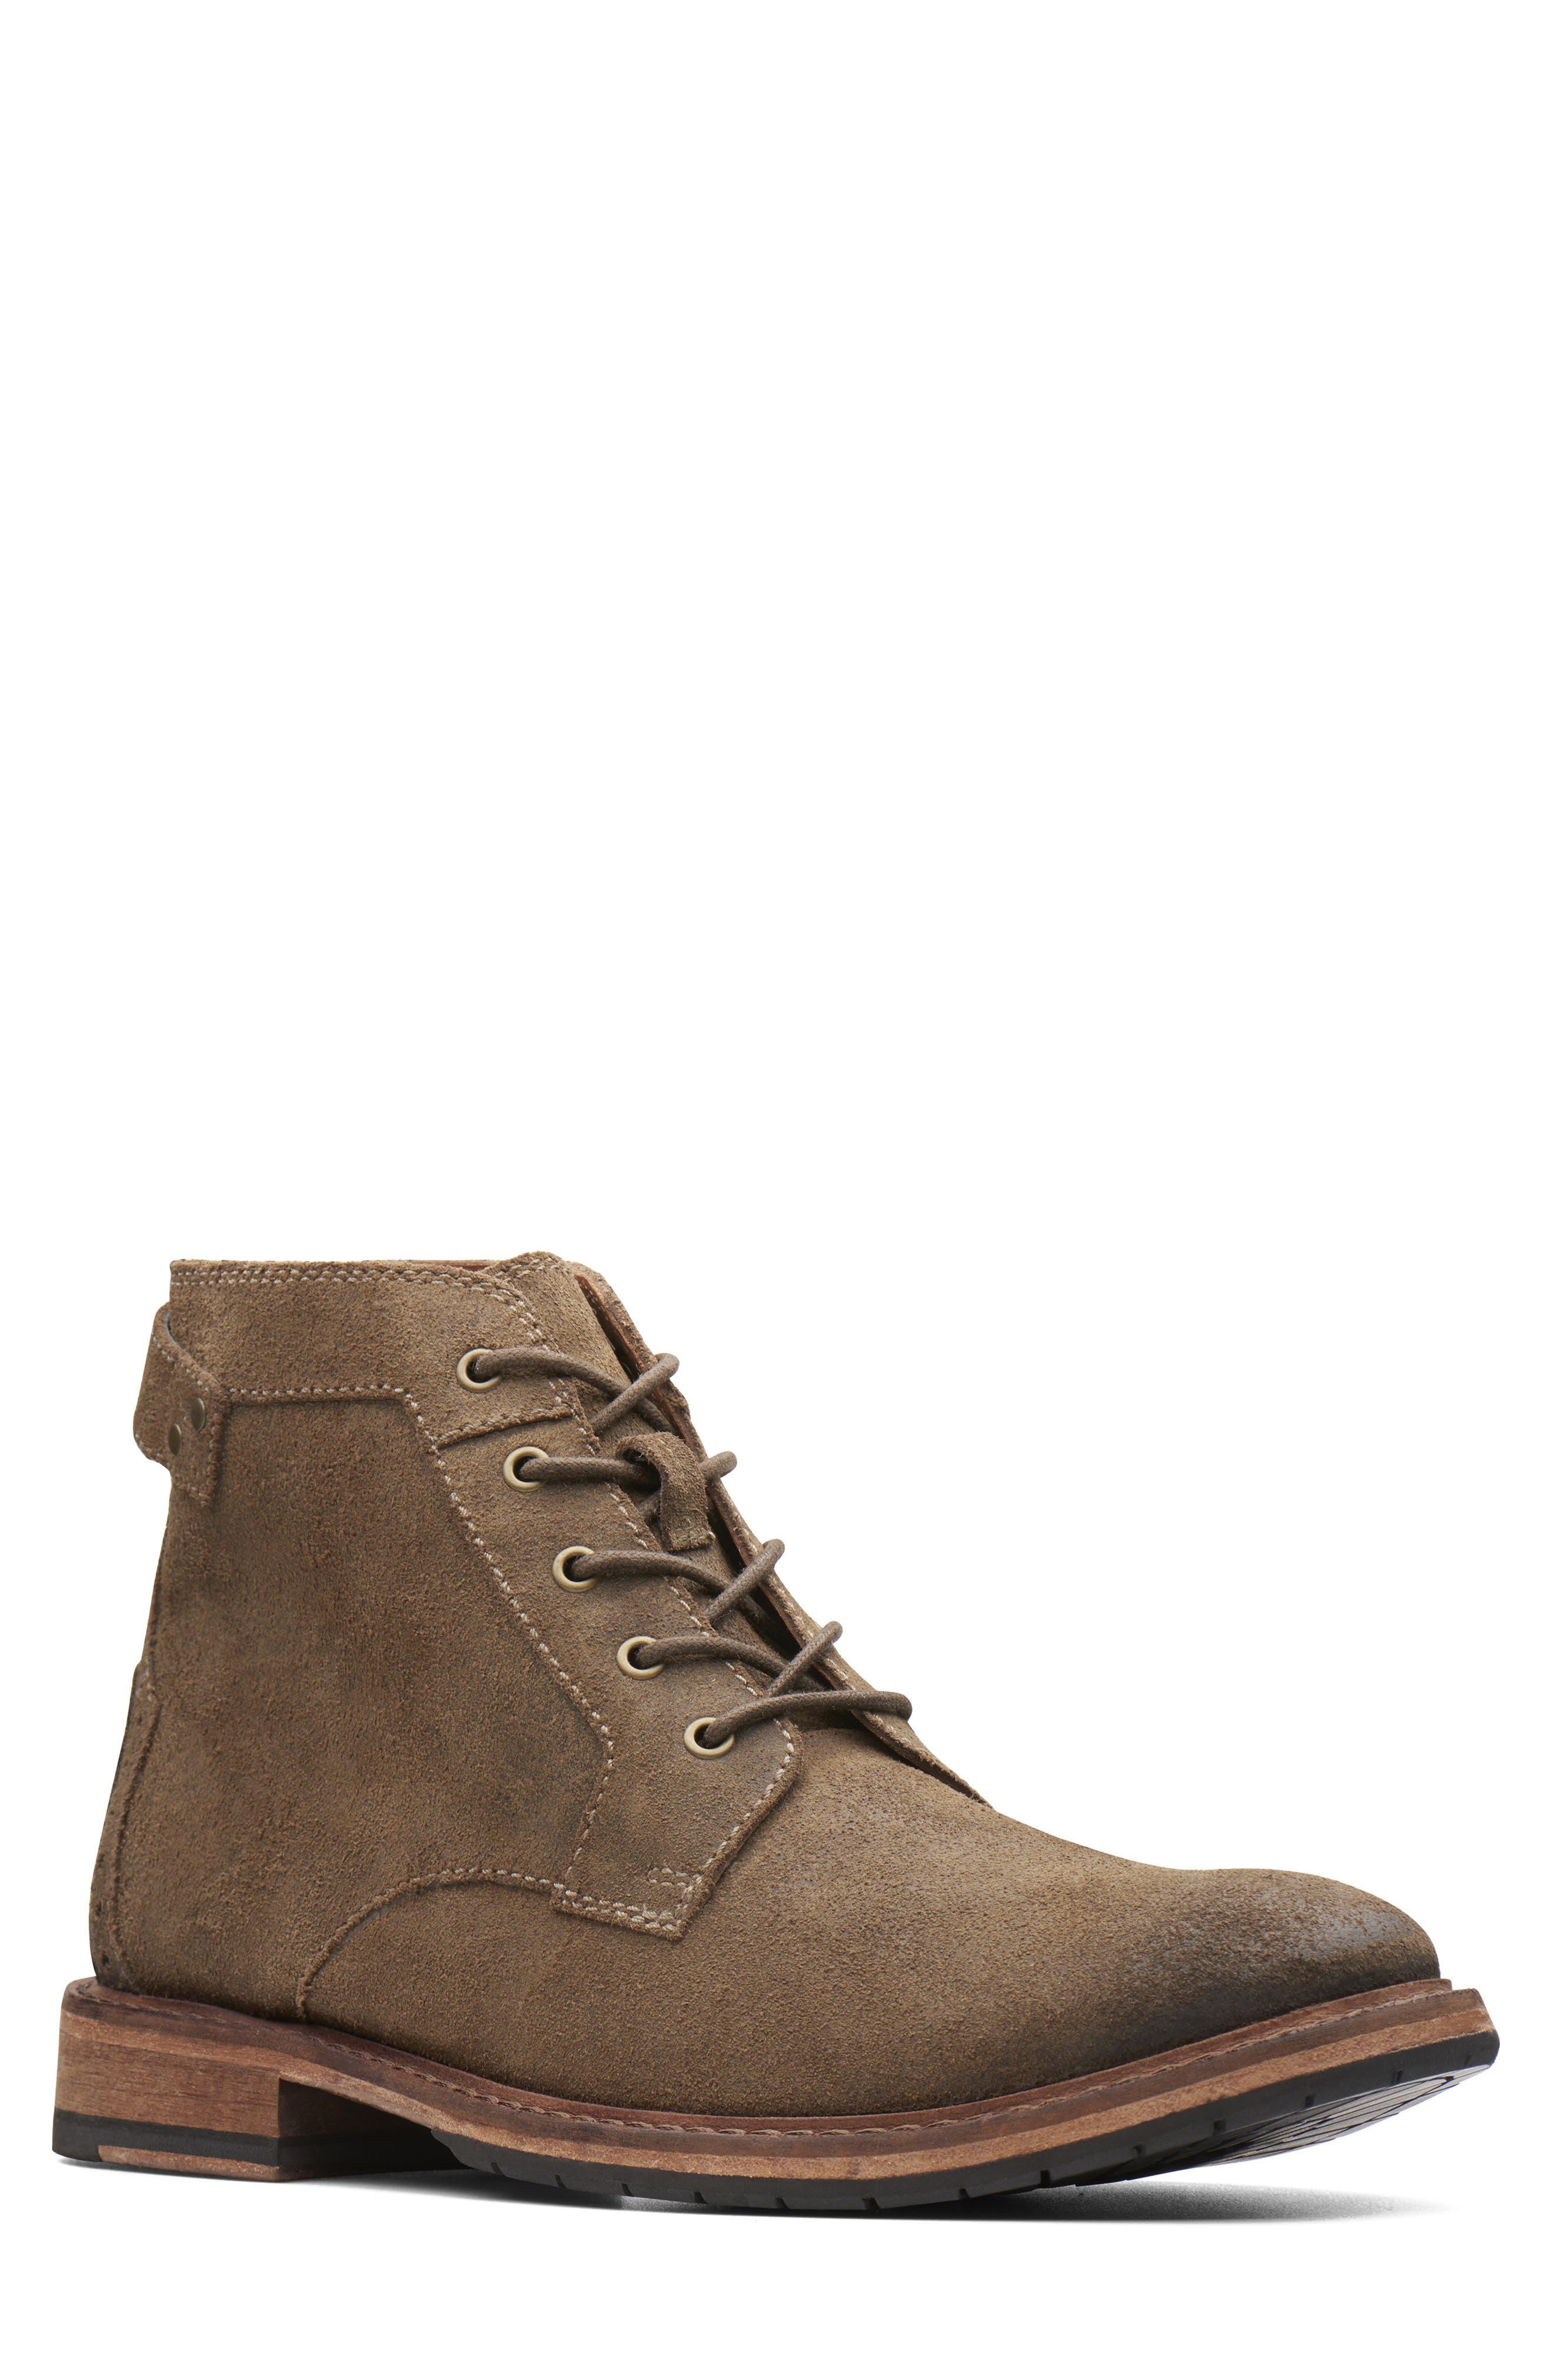 Clarkdale Bud Plain Toe Boot,                         Main,                         color, KHAKI SUEDE